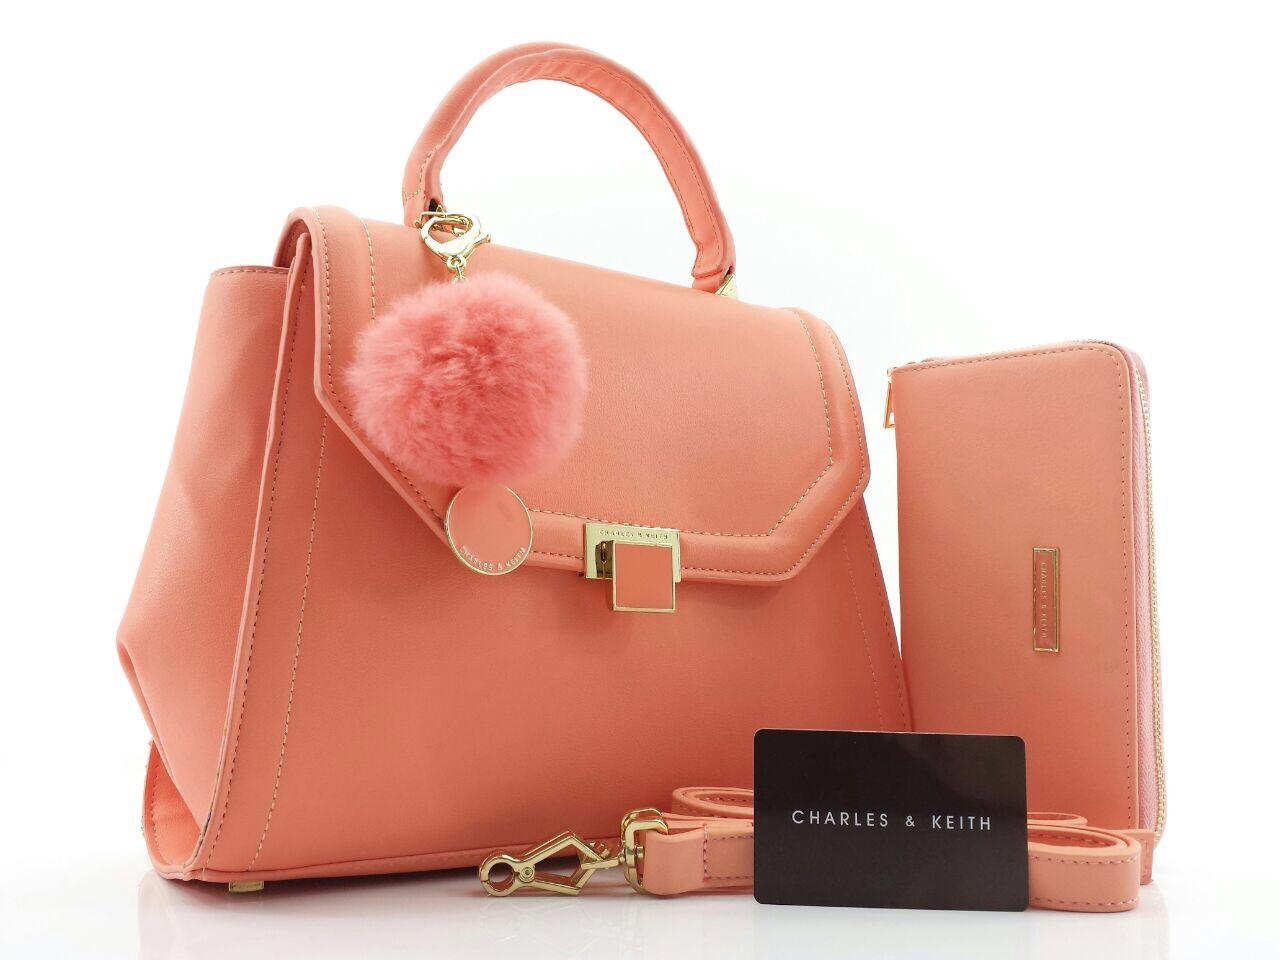 Tas Wanita Charles N Keith Fashion Cewe Daftar Harga  Tangan Branded Ck 00773 Terbaru Set Dompet 043 Semprem